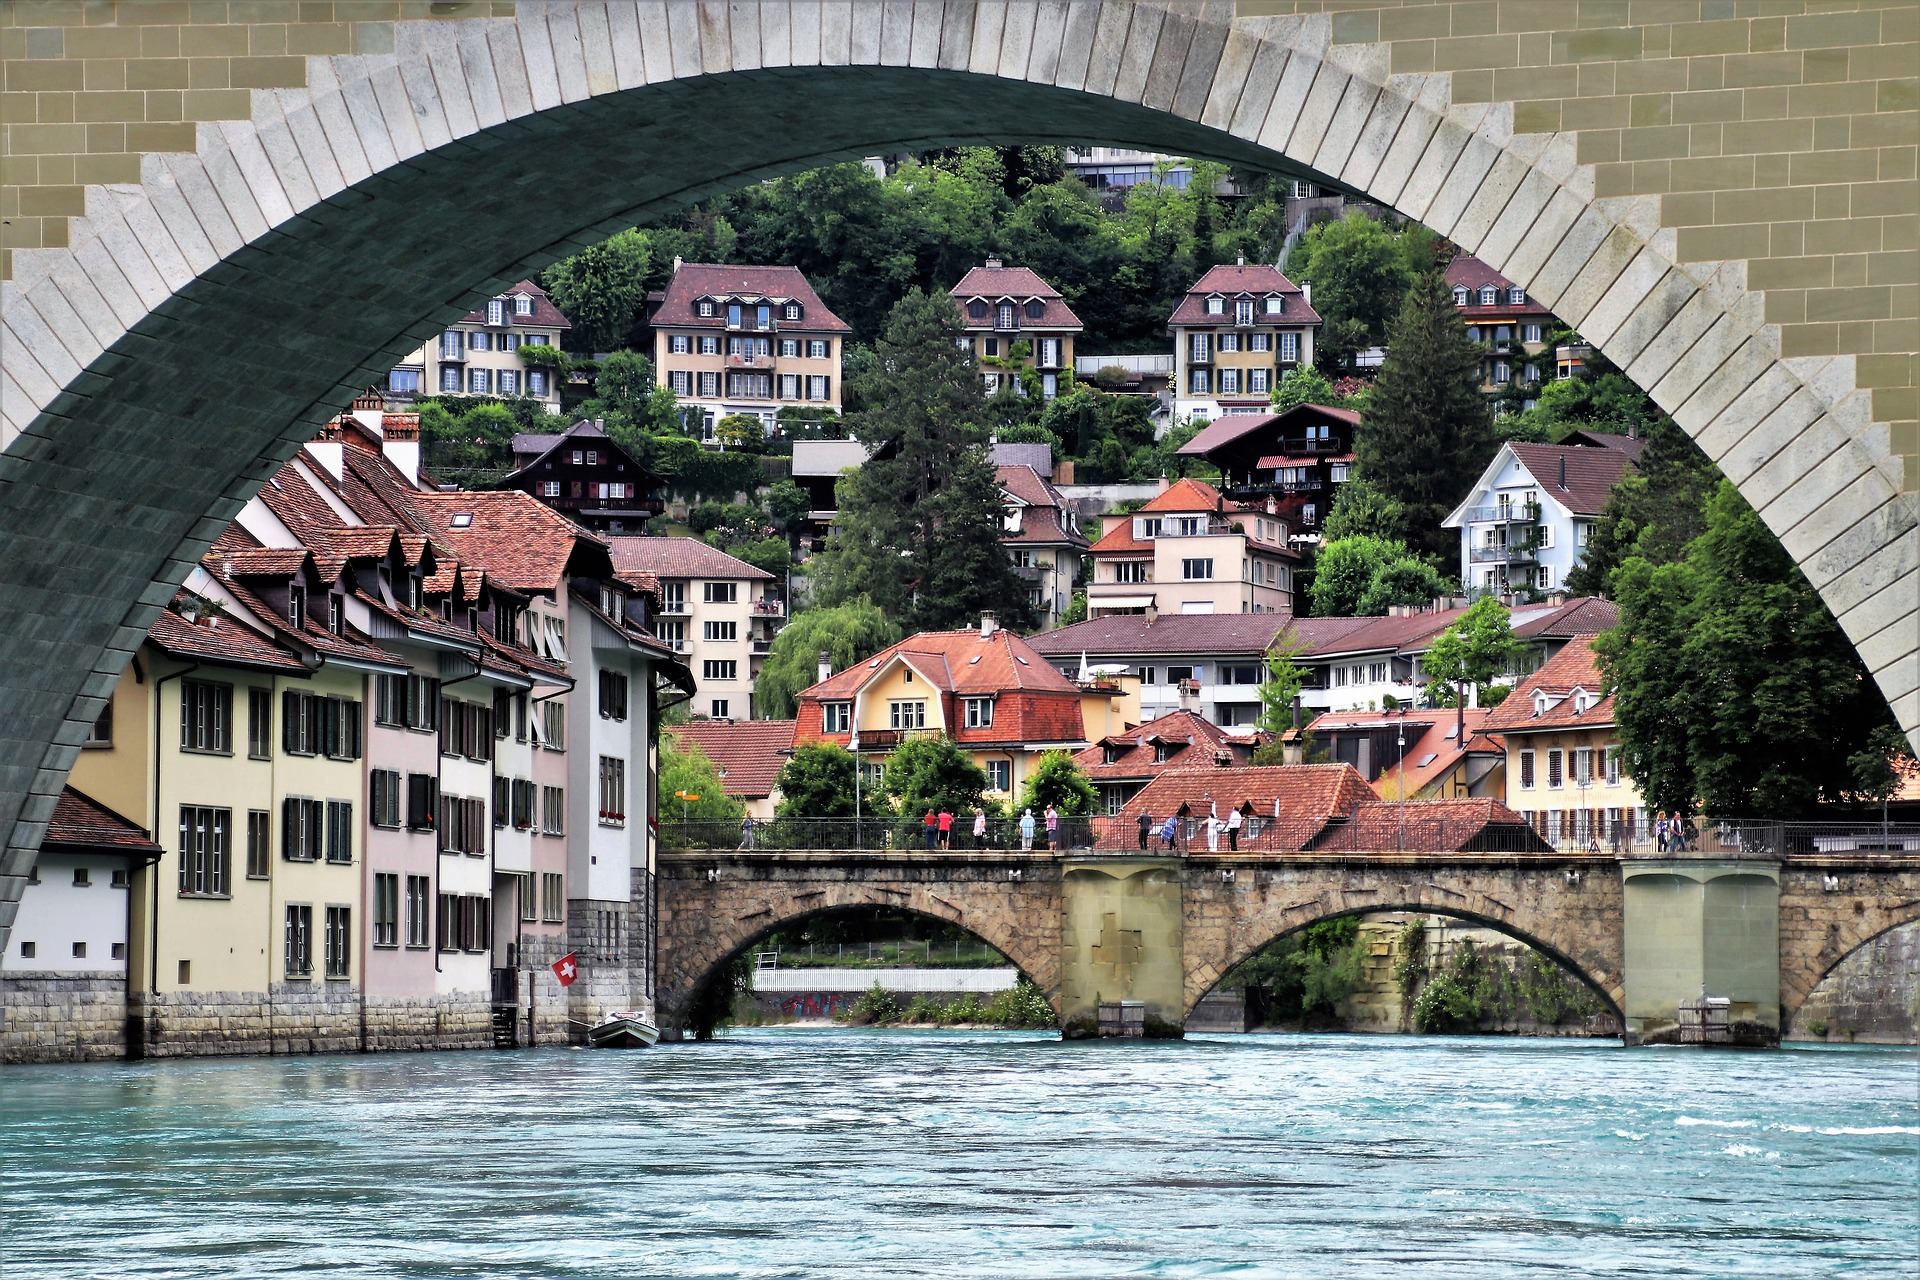 Bridge Switzerland | Backpacking with Bacon | Backpacking in Switzerland